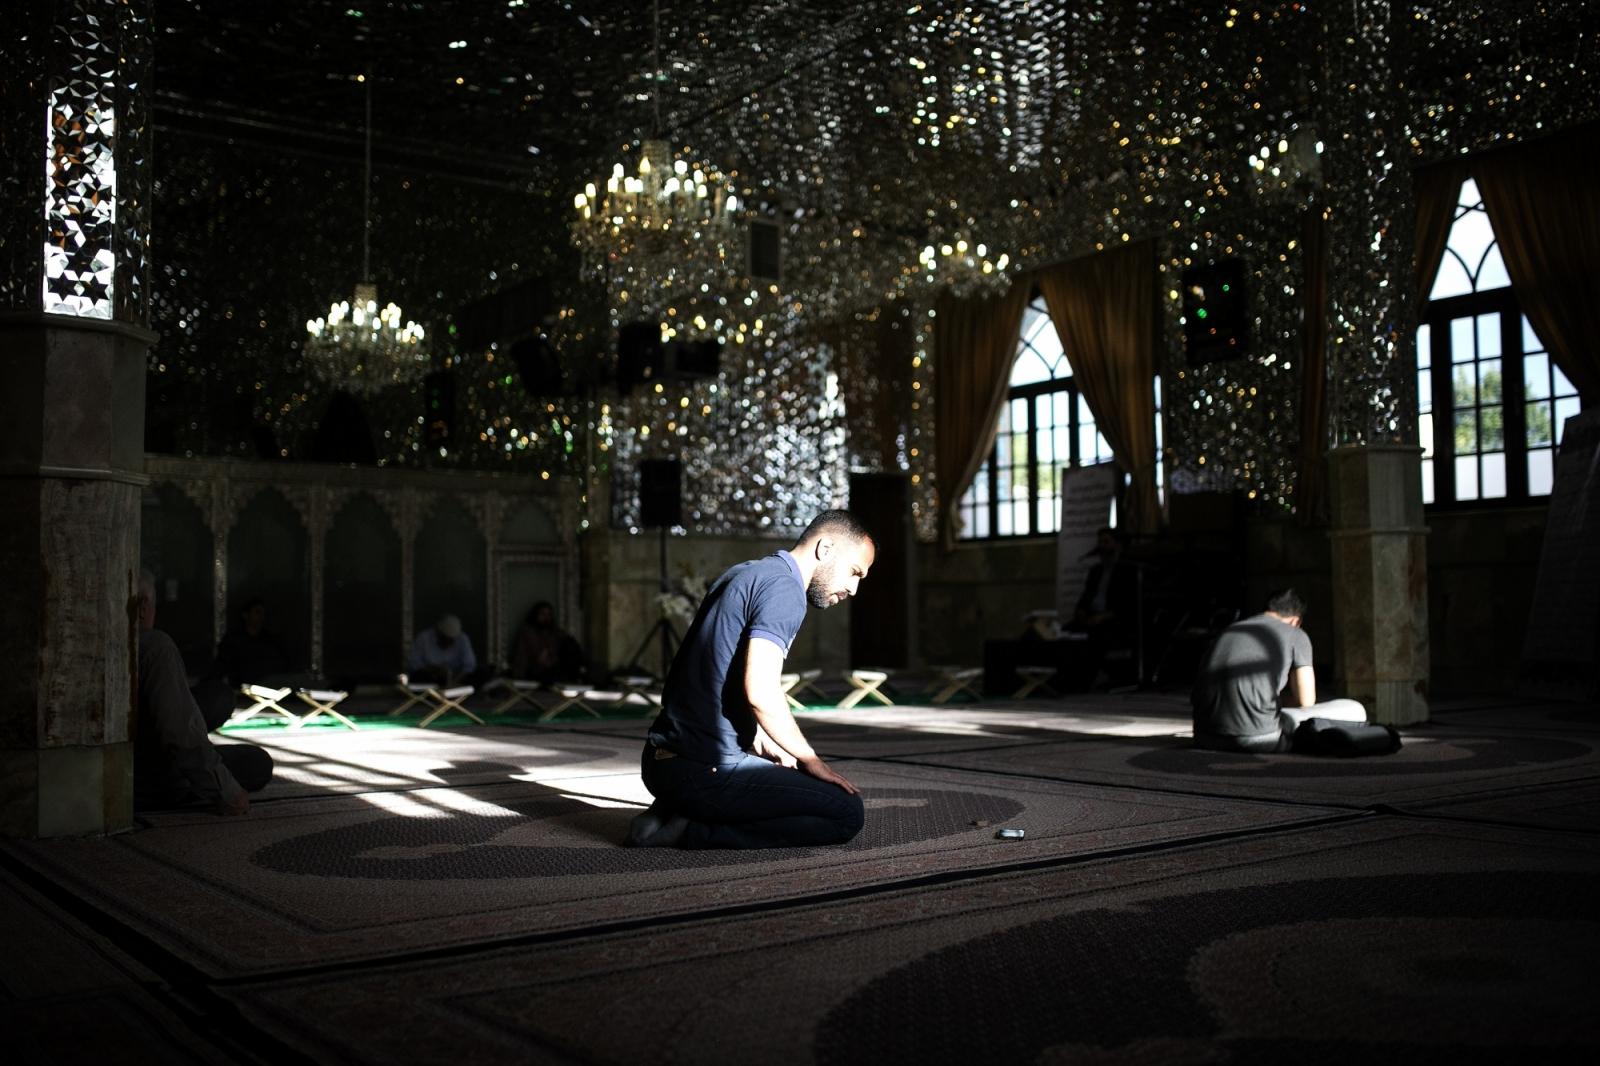 Jerusalem's Al Aqsa Mosque Reopens after 2 Months